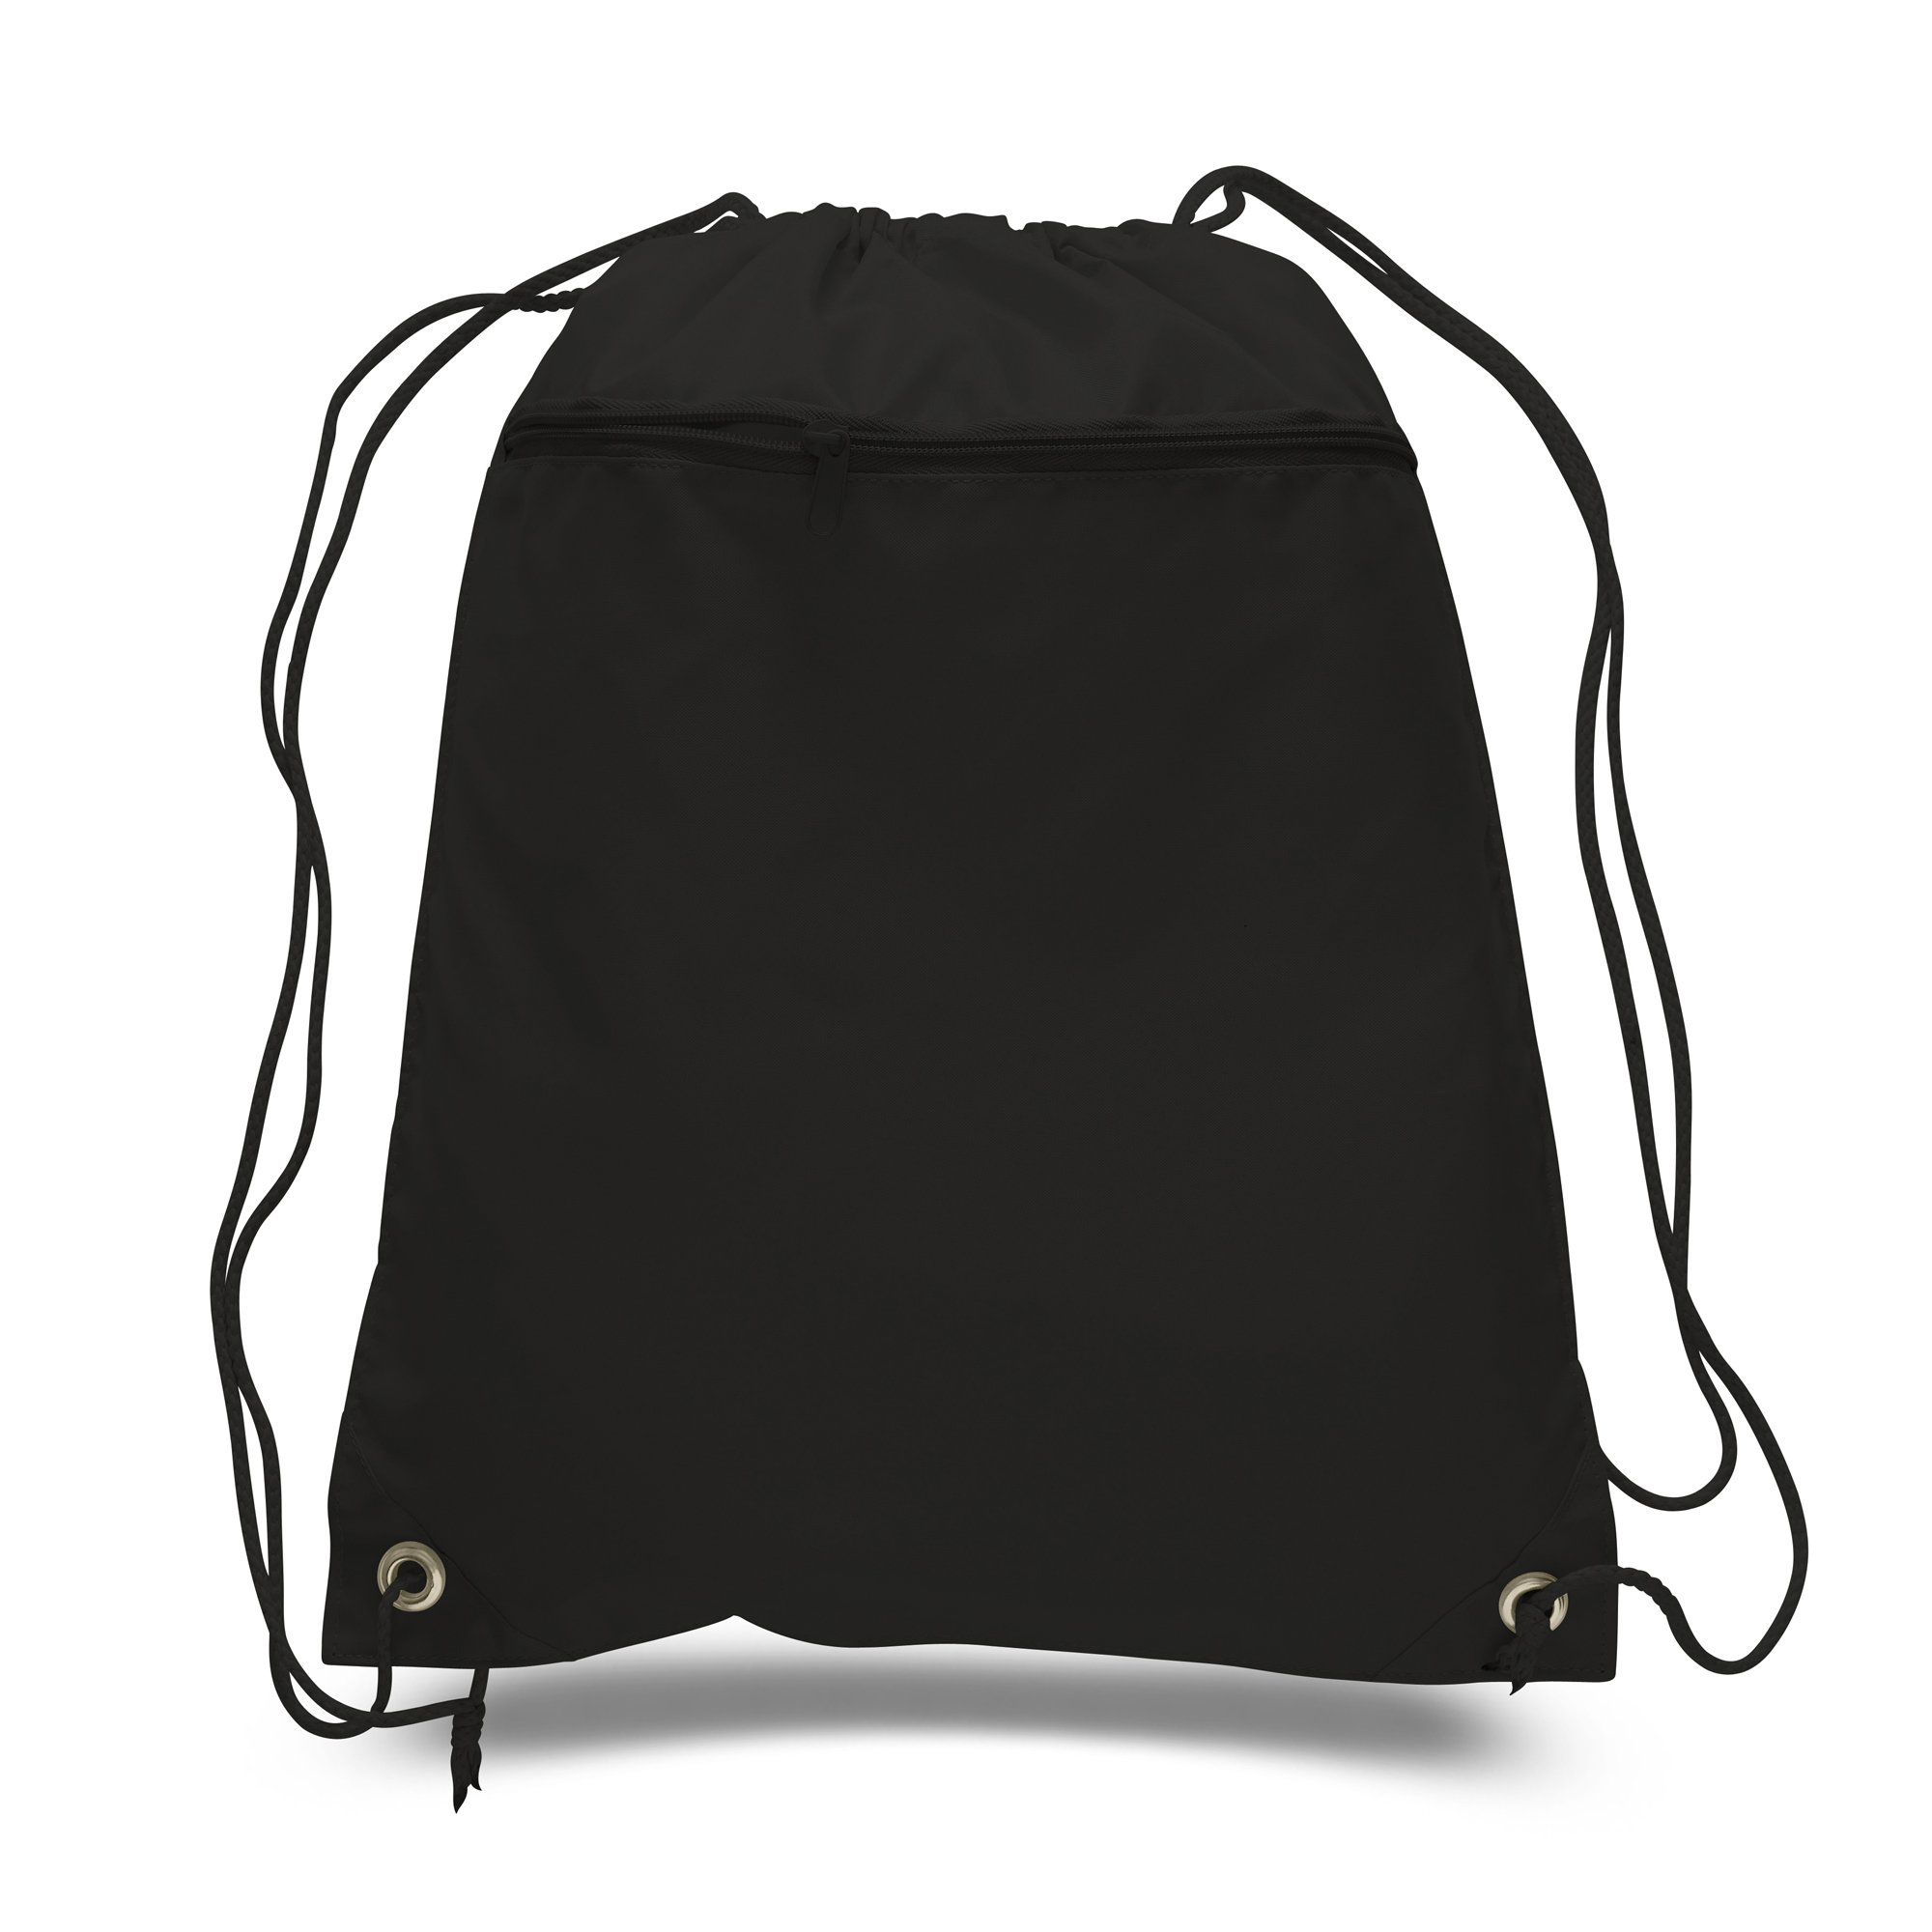 (SET OF 144) BagzDepot BULK Polyester Promotional Durable Gym Drawstring Backpacks with Front Zipper Pockets, Cinch Bags, Sack Packs in Bulk (Black)